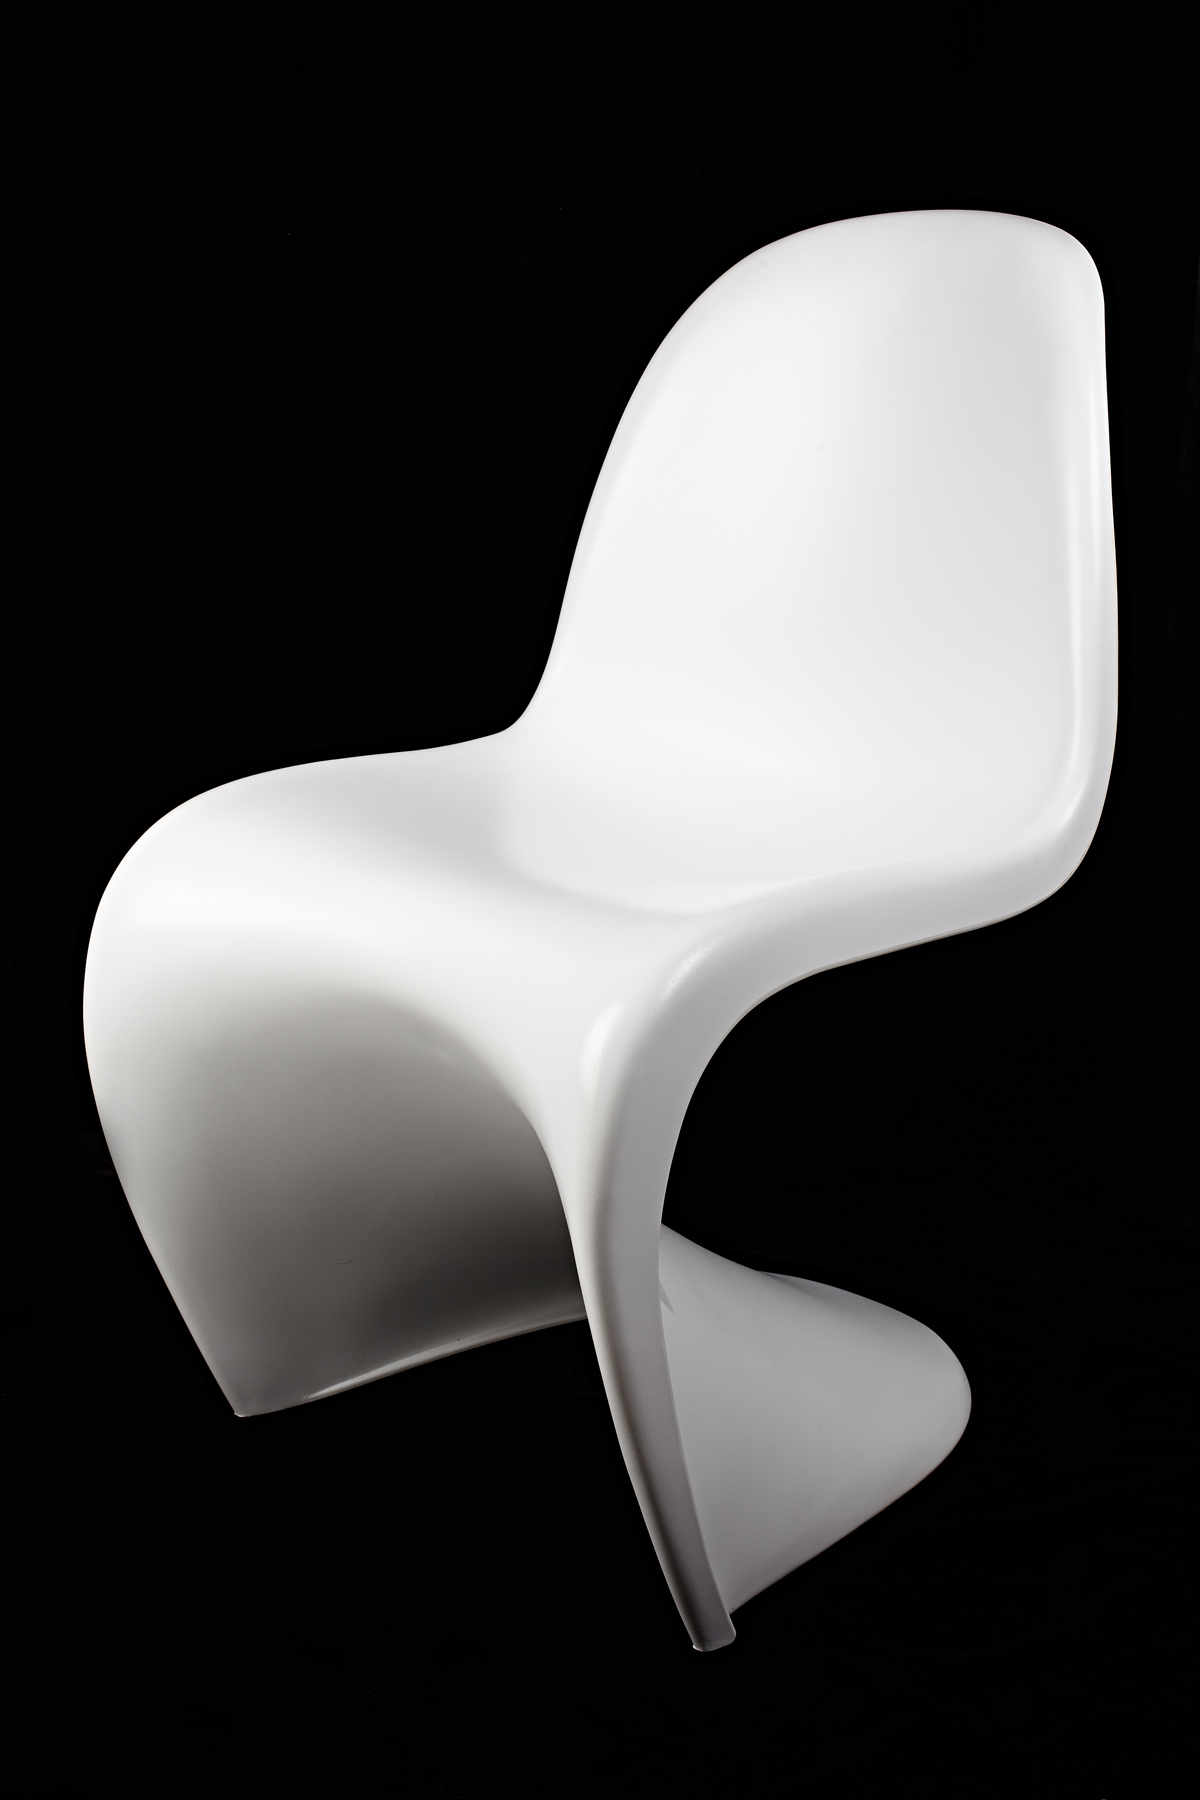 Midcentury_Modern_Chair.jpg